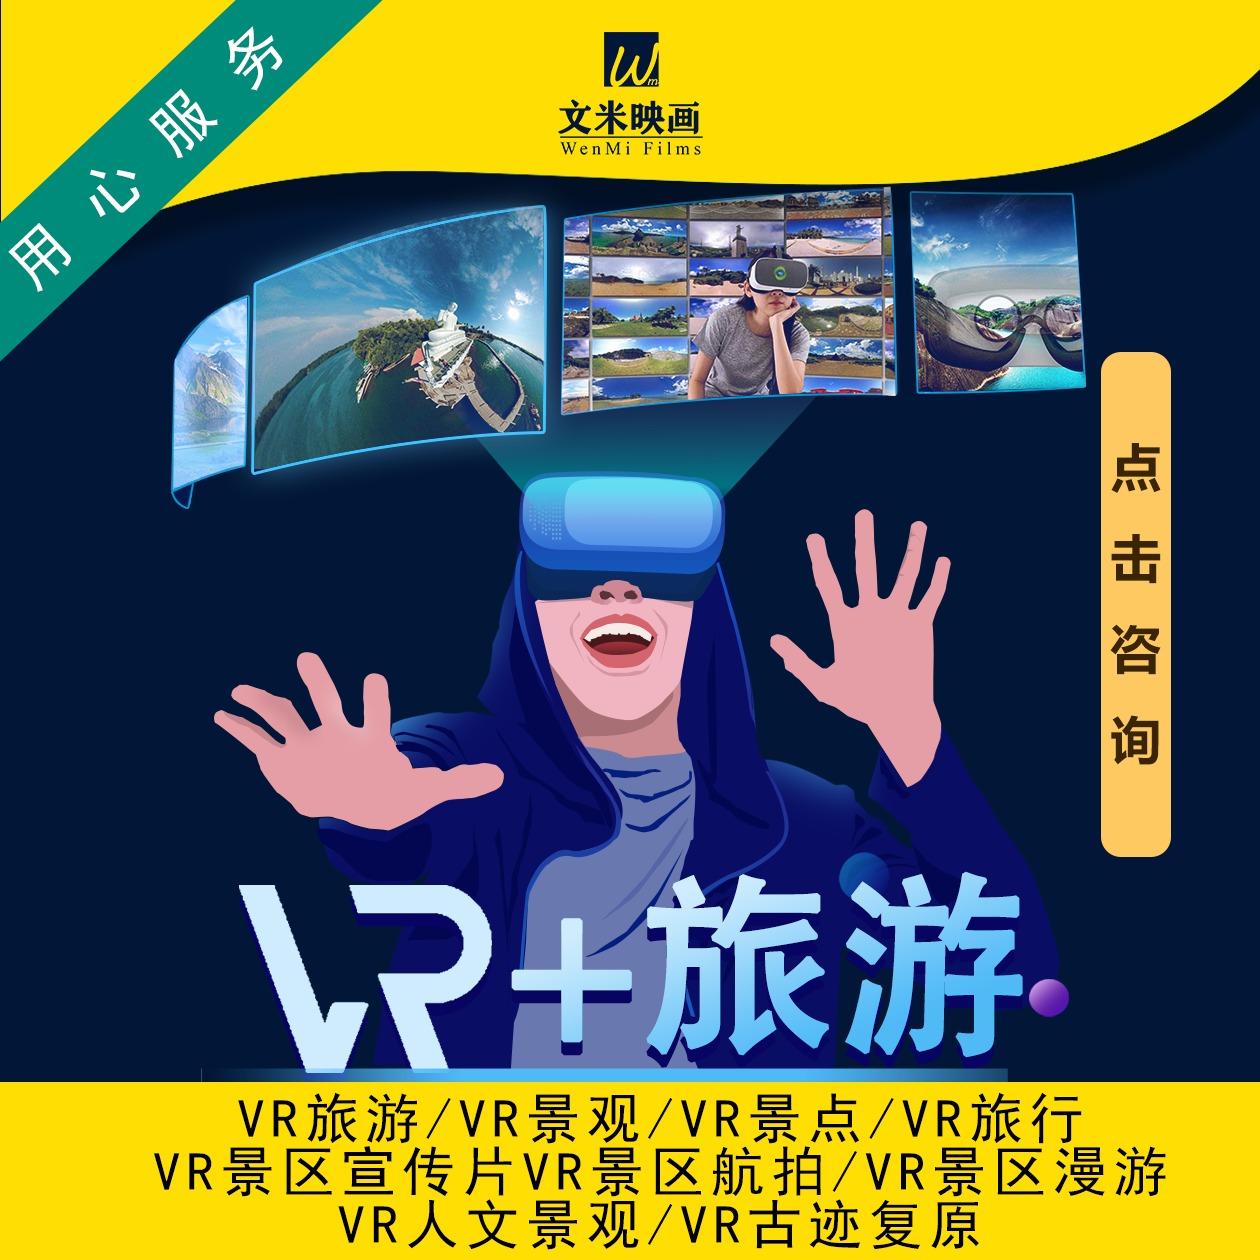 VR+行业解决方案VR+旅游拍摄制作景点景区漫游人文景观景区